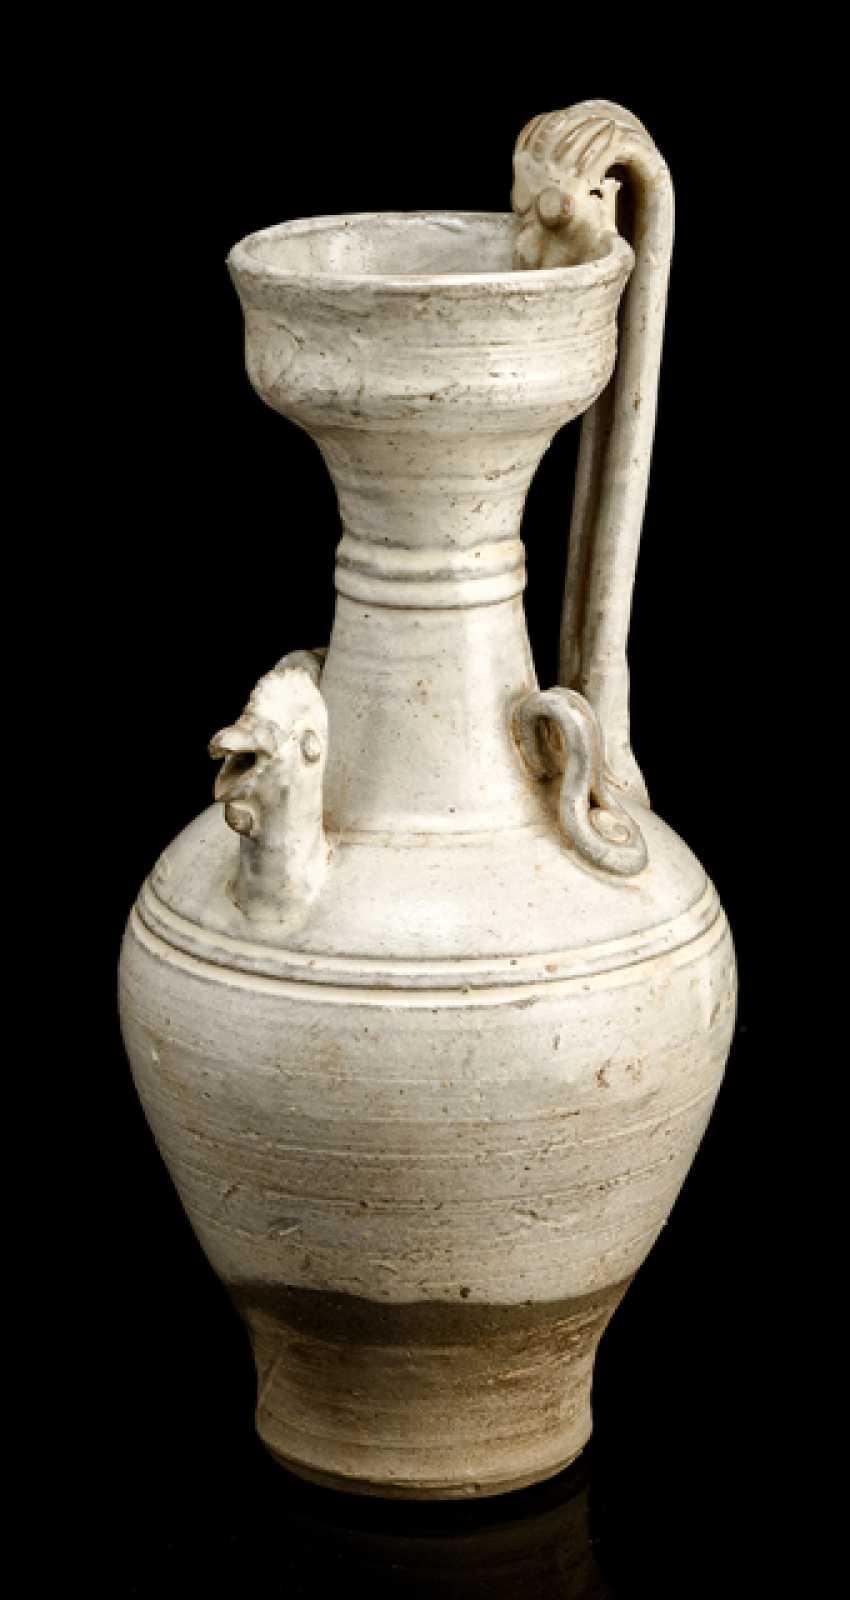 Cizhou-jug with cream glaze and cock head spout - photo 1